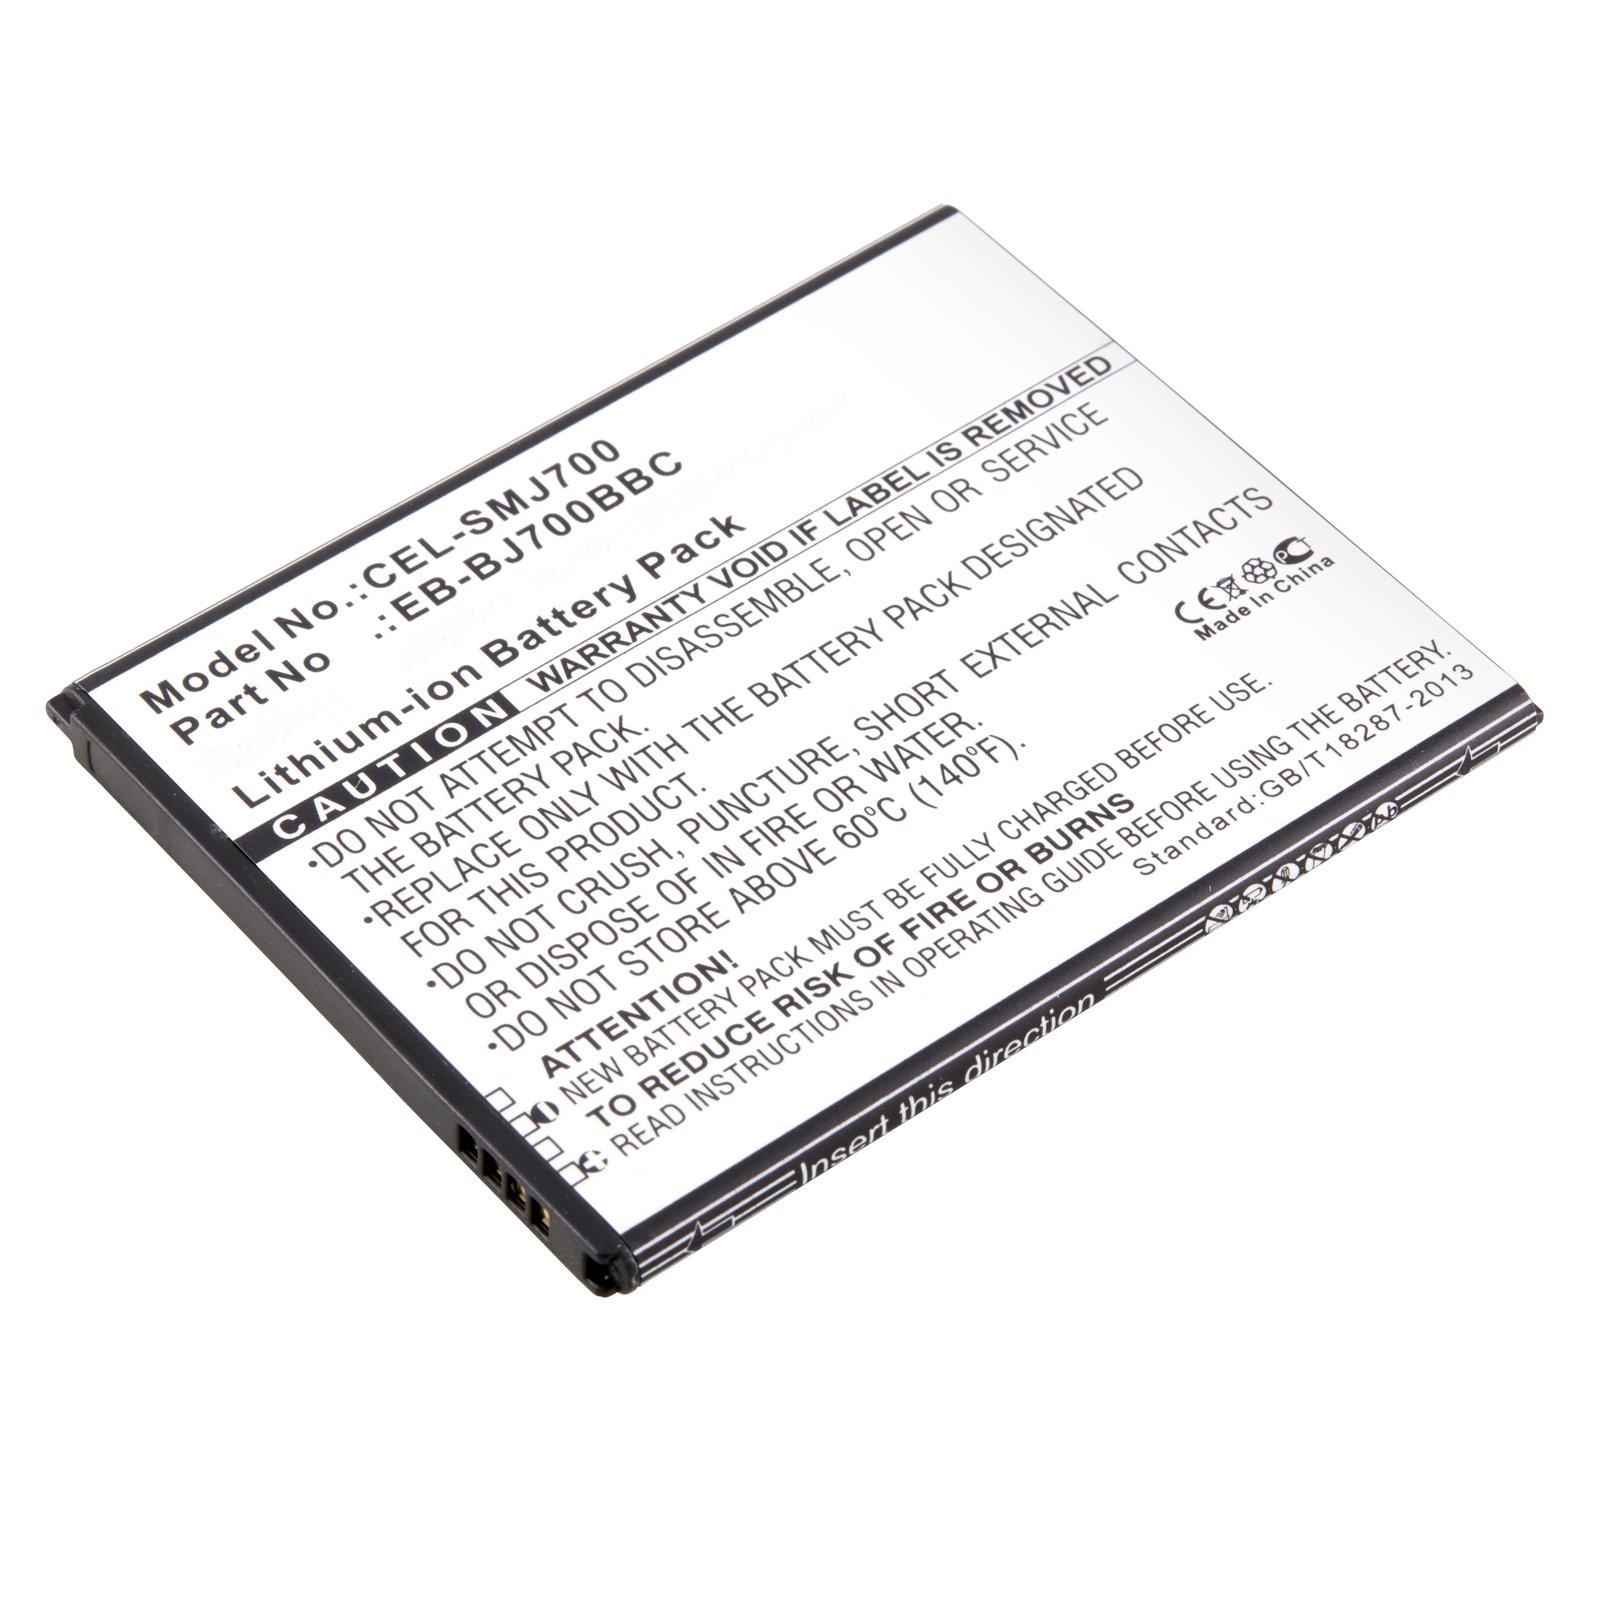 Replacement Samsung Eb Bj700bbu Cell Phone Battery